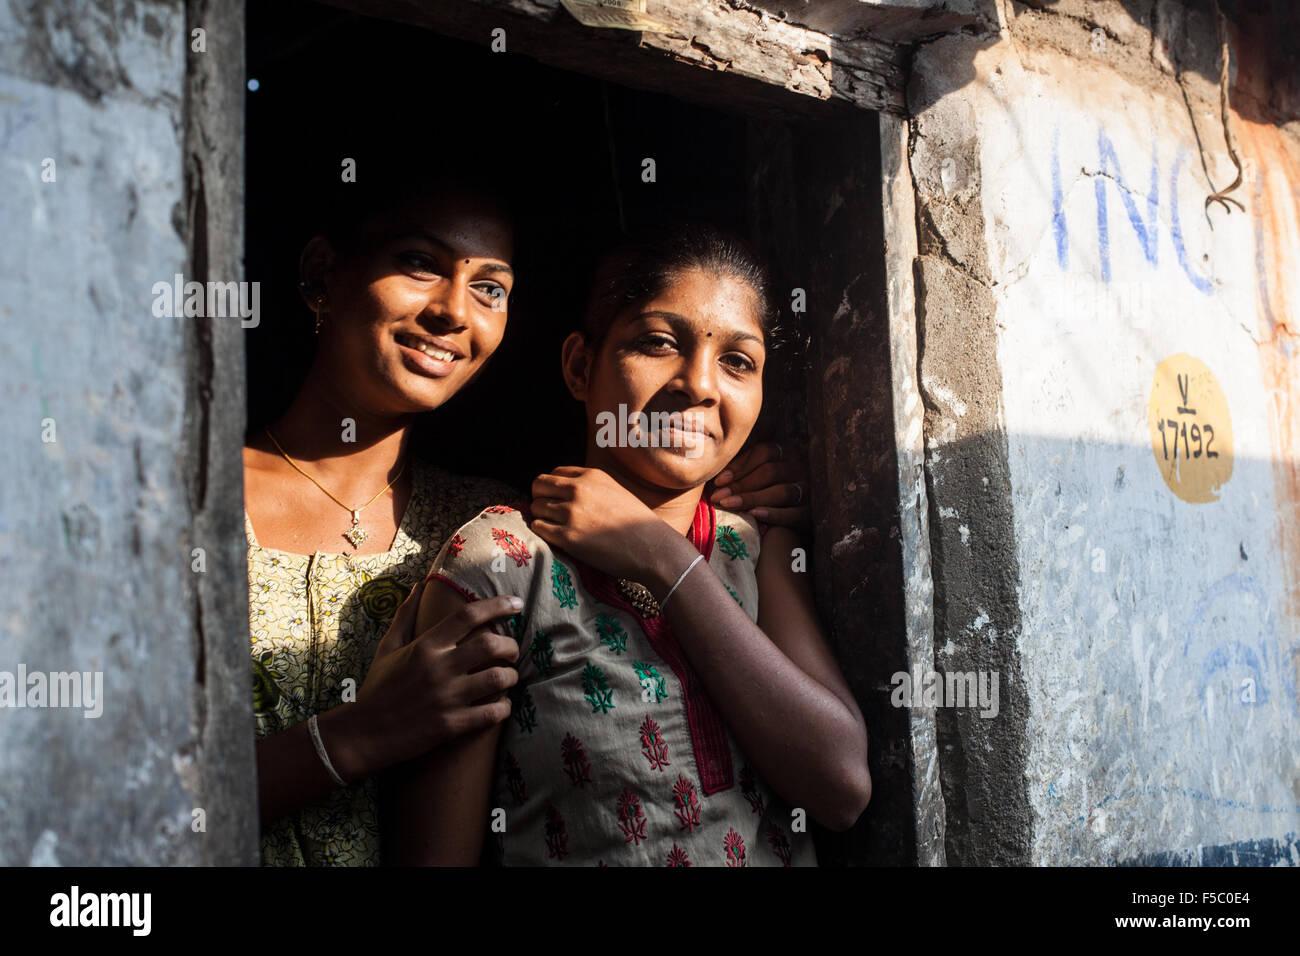 Vizhinjam Christian fisherman village in Kerala, India, November 2014. Young unmarried Christian women - Stock Image